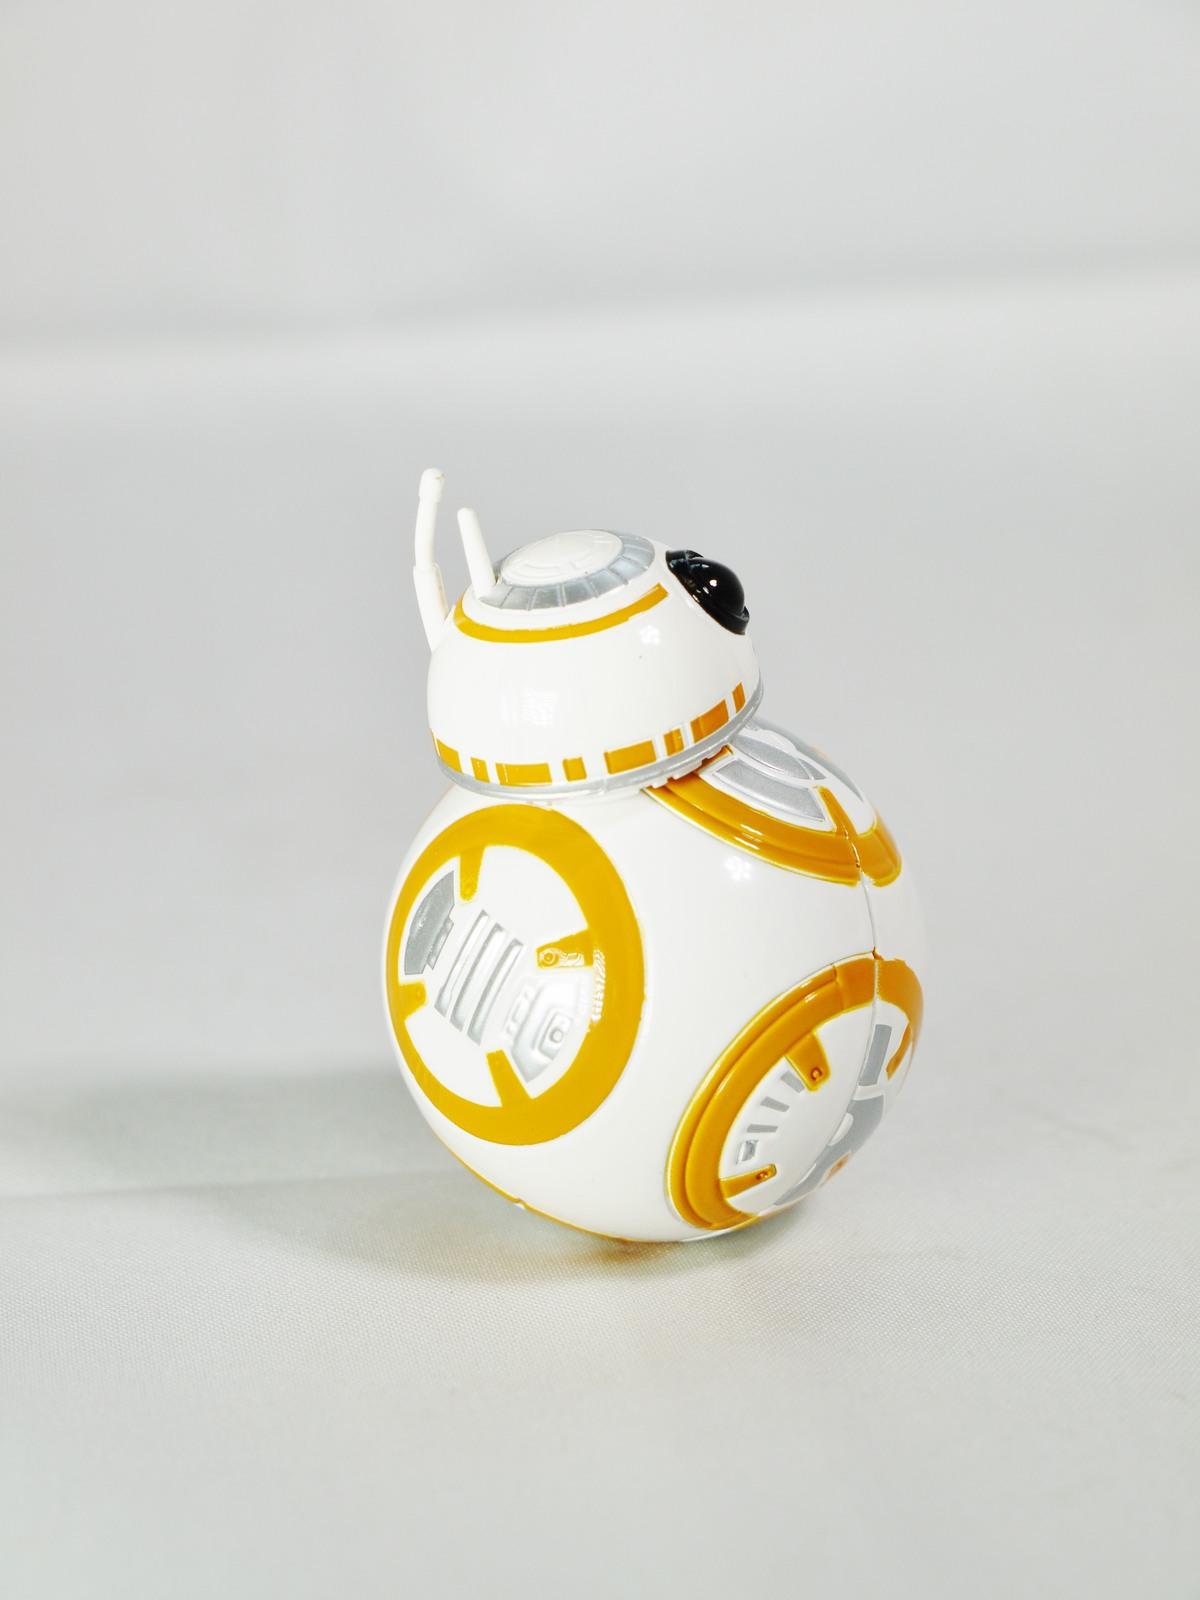 BB-8 Mini Metal Action Figure by Takara Tomy Star Wars